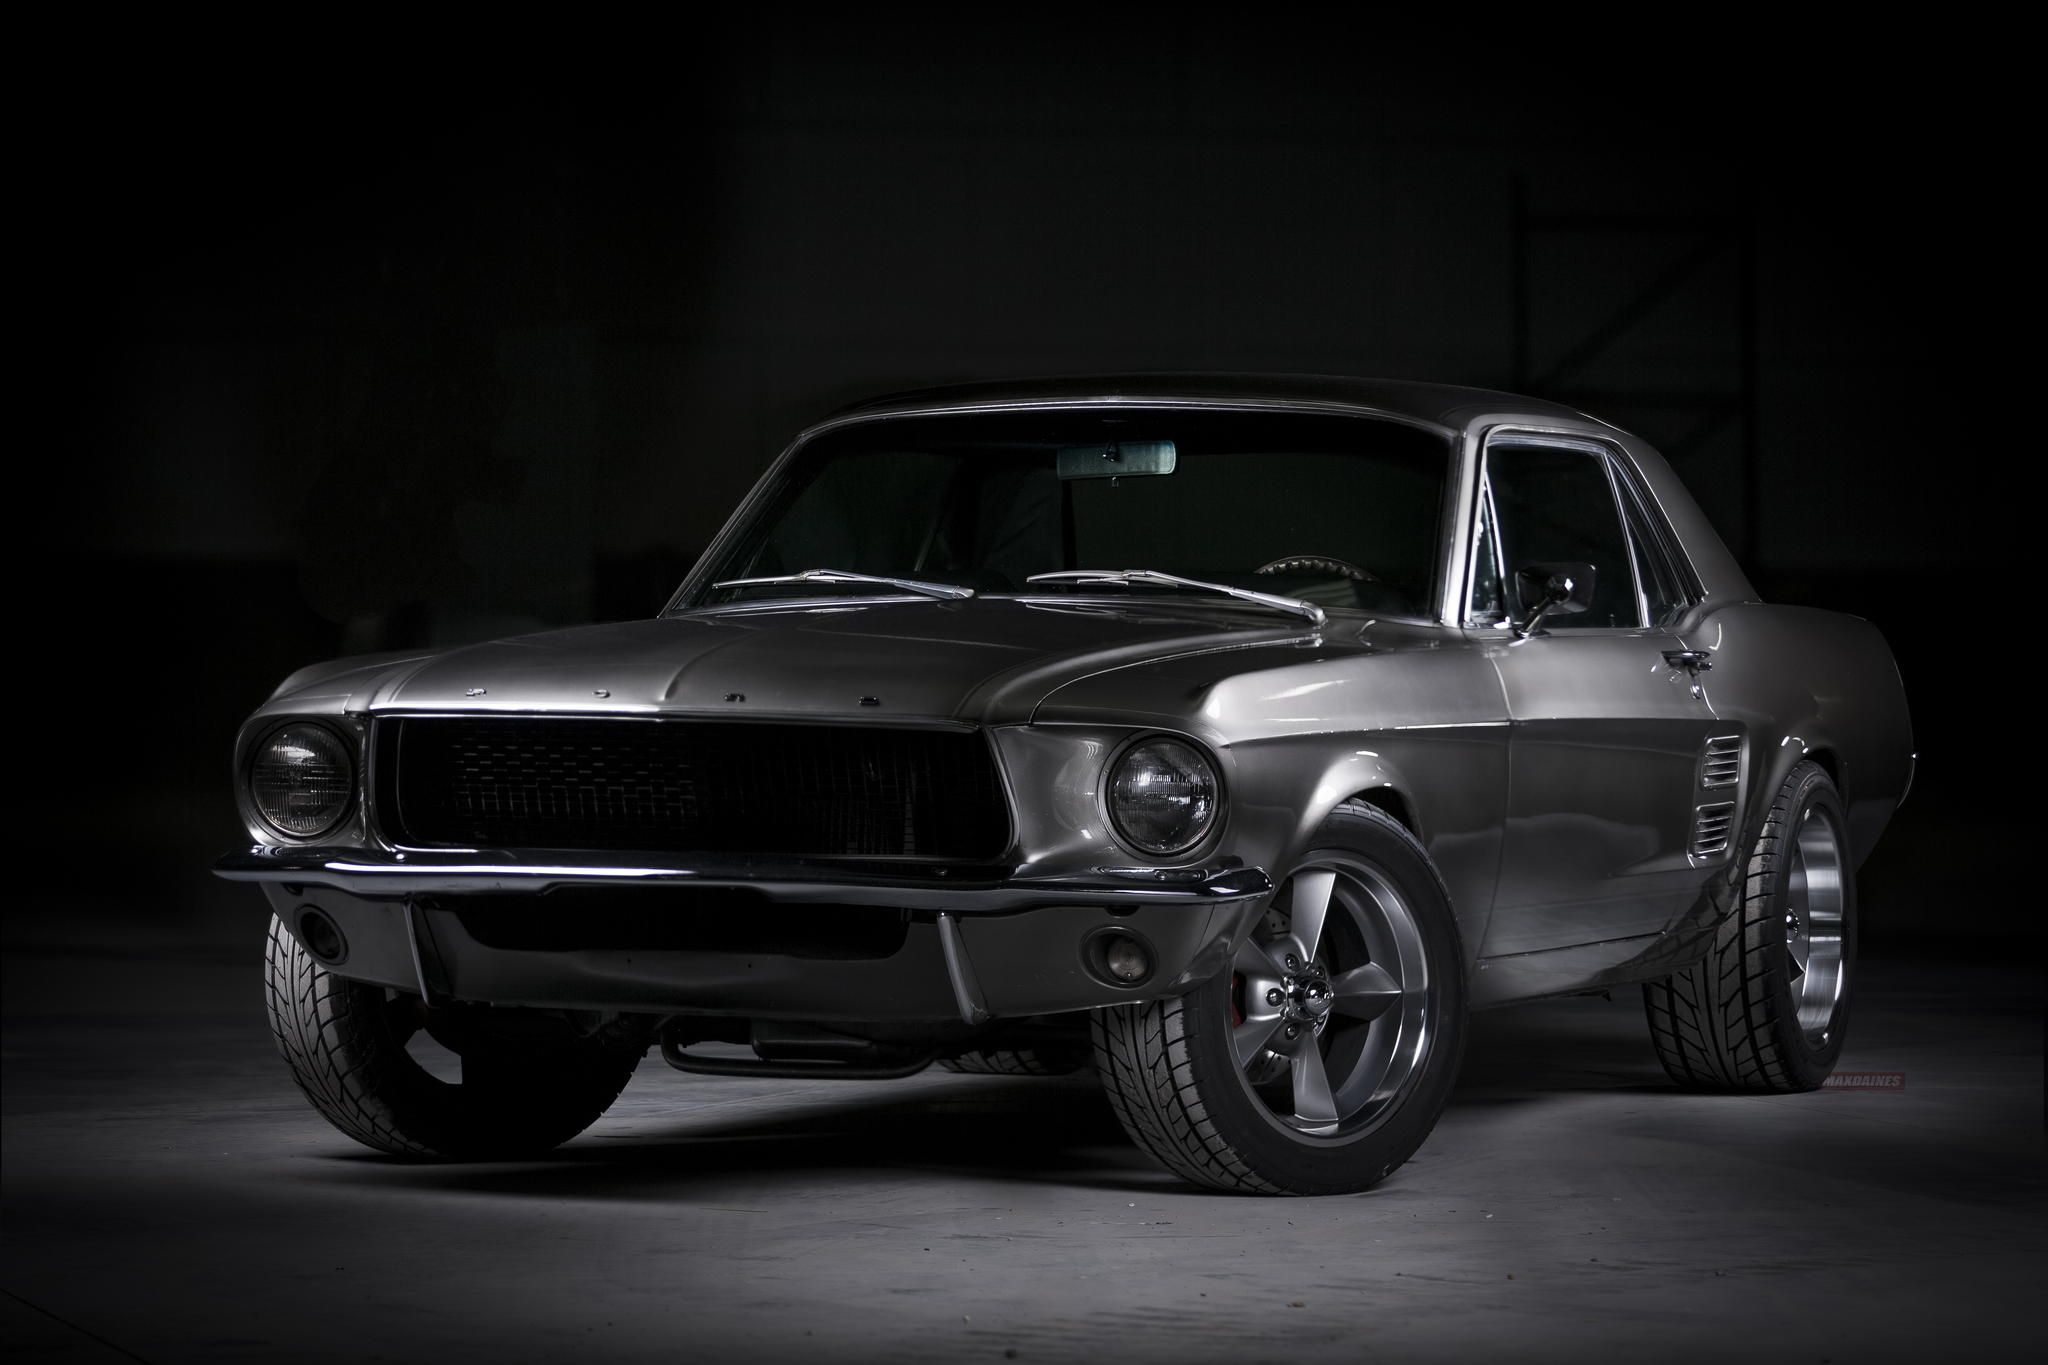 Mustang Wallpaper Wide YKh cars/trucks Ford mustang